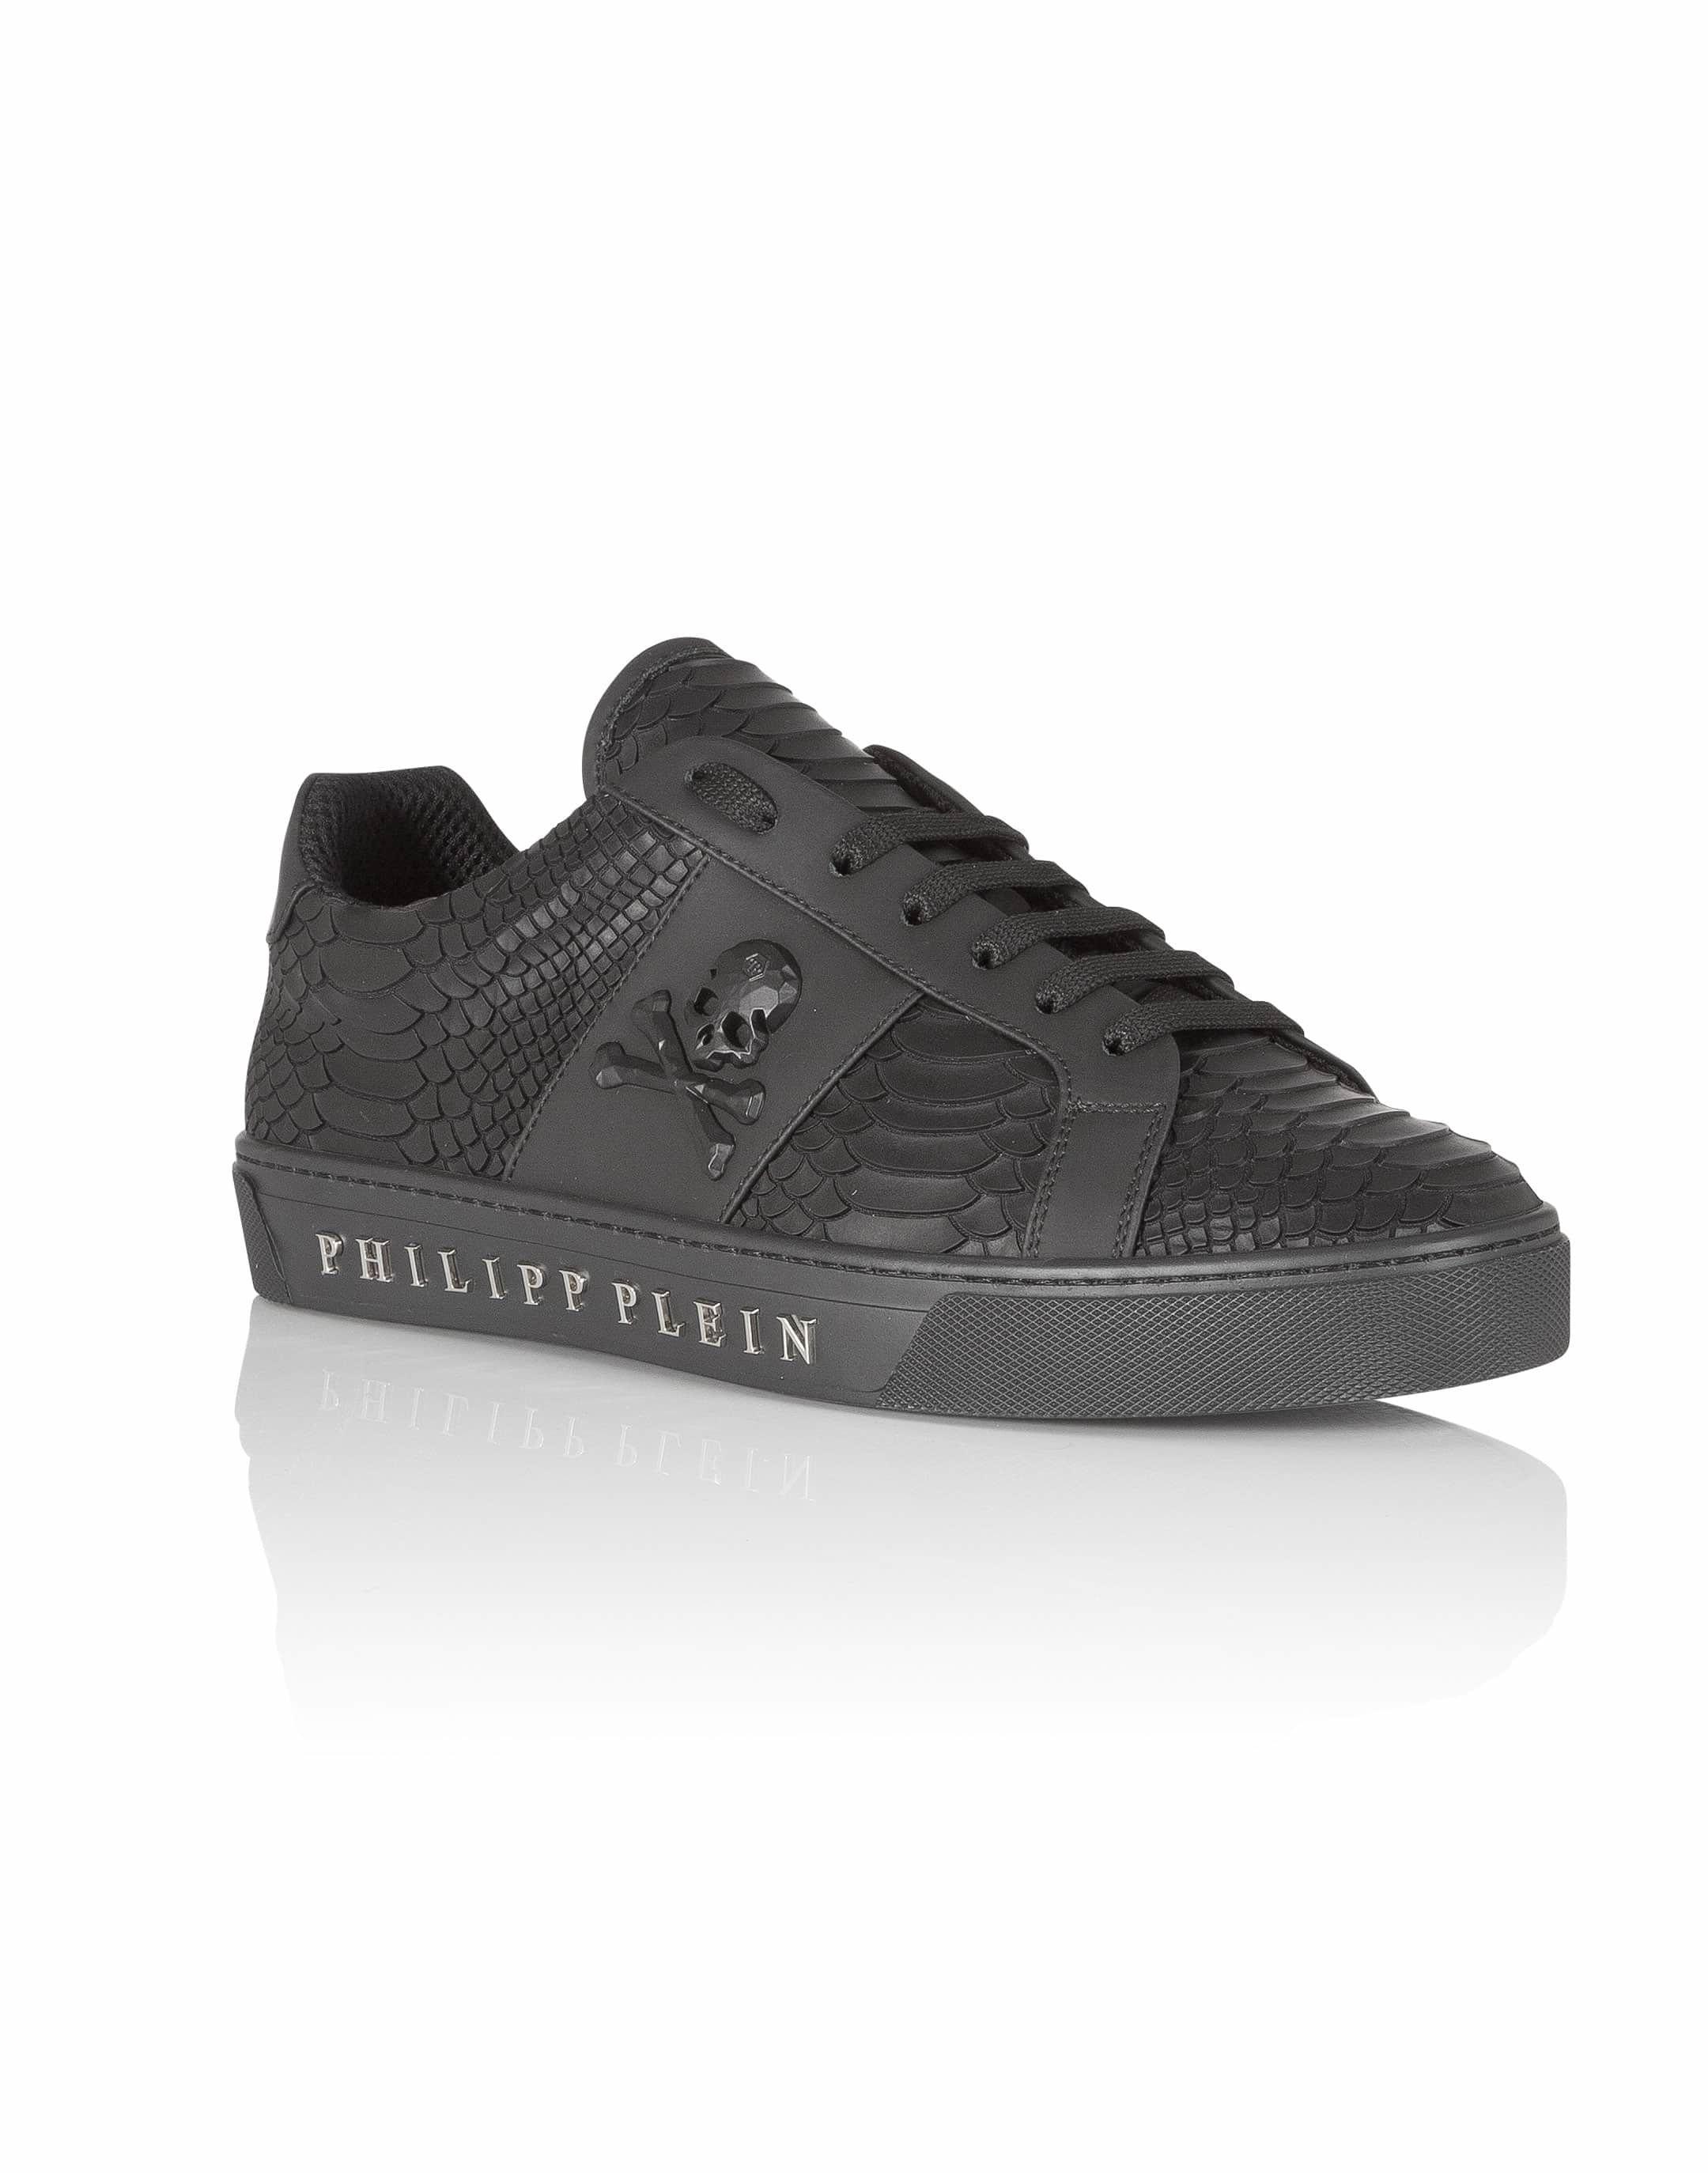 "Philipp Plein Lo-Top Sneakers ""talk slow"""